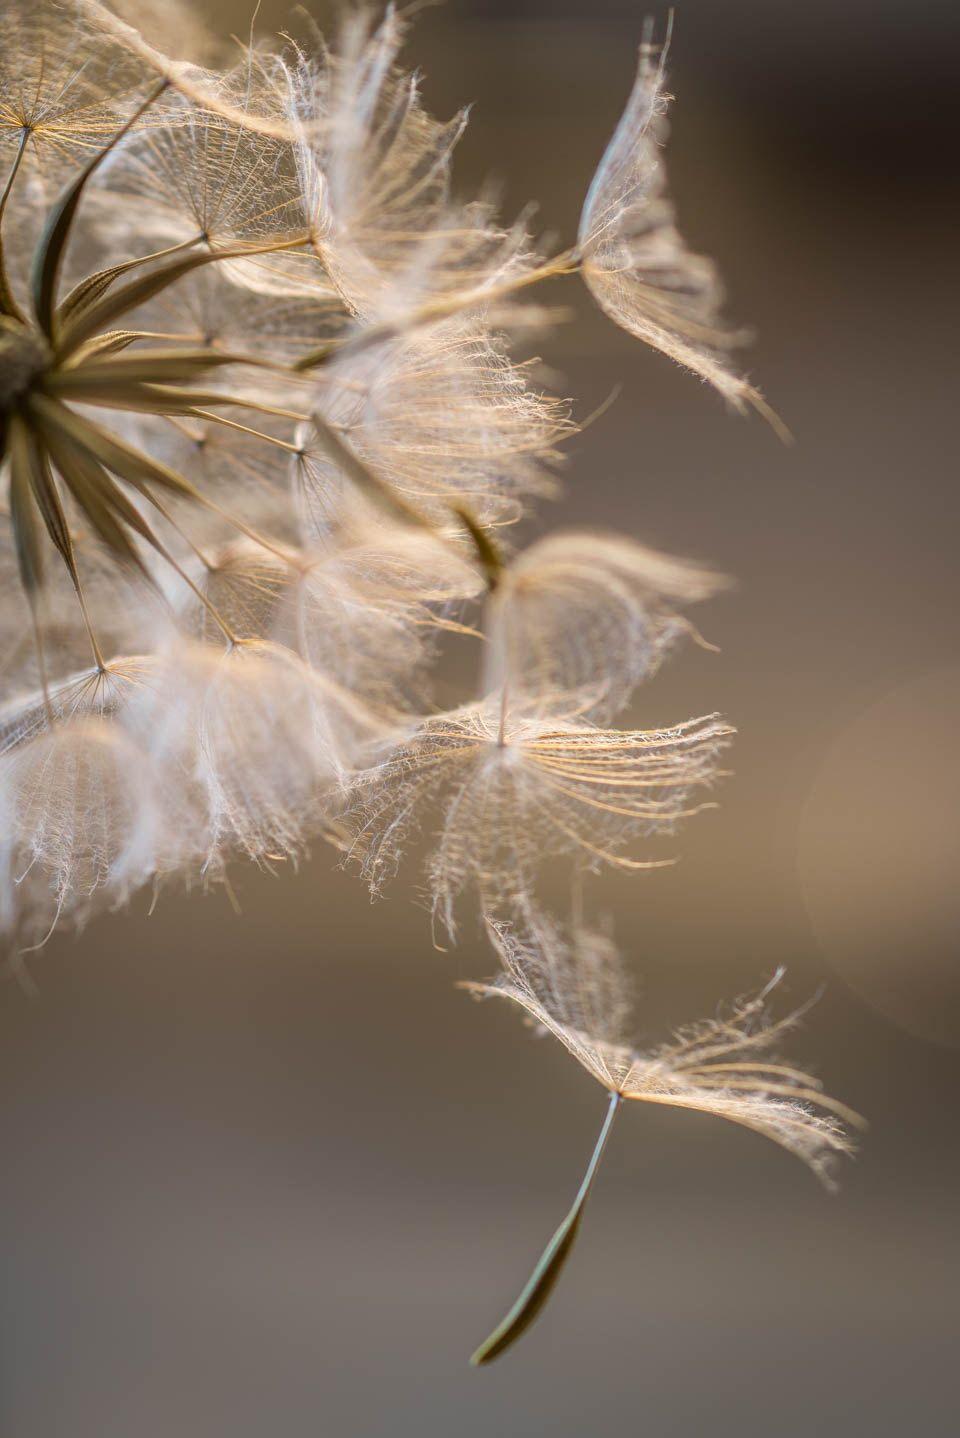 Garden Sunshade Dandelion Flowers Nature Photography